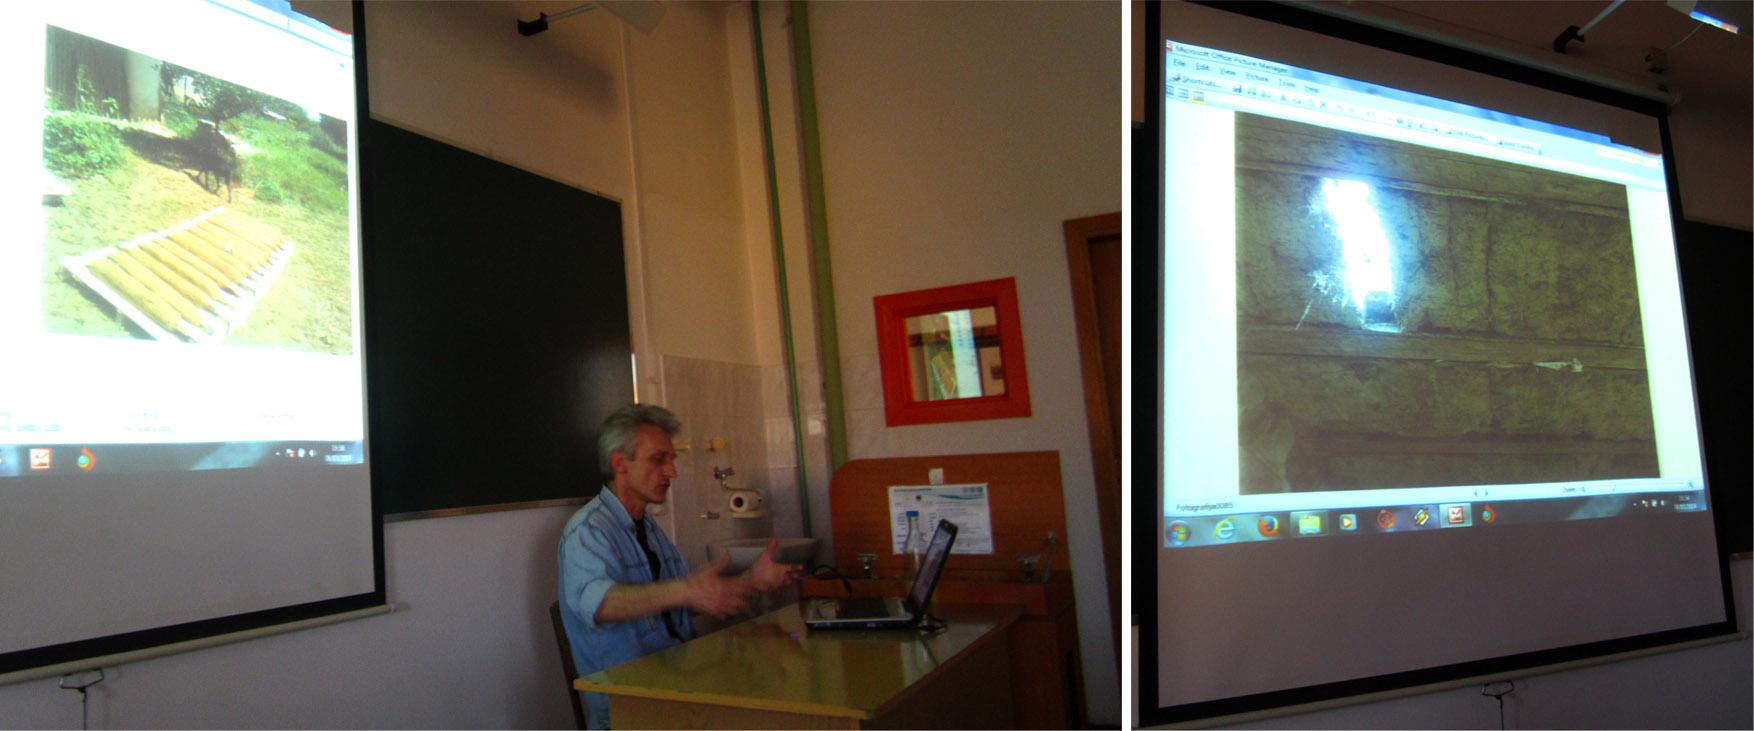 08 ubrzani kurs zemljane arhitekture Miodrag Antic